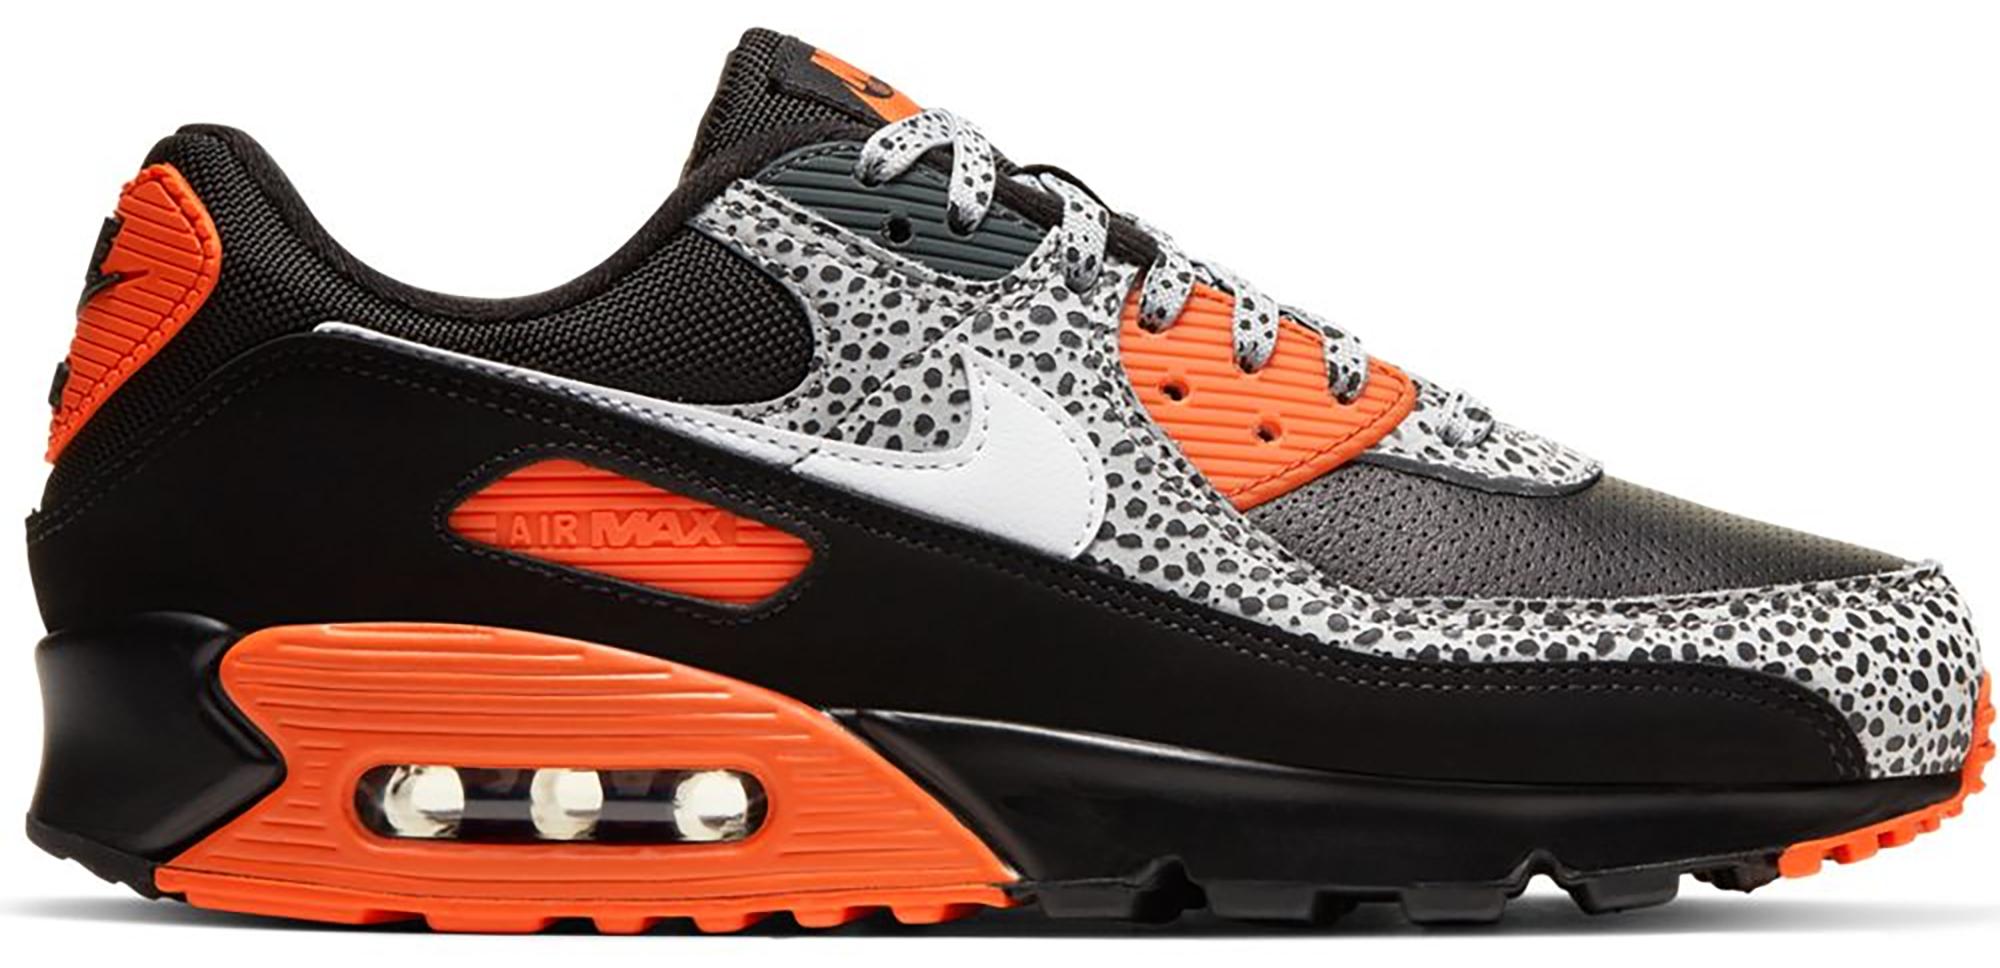 Nike Air Max 90 Safari (2020) - DA5427-001